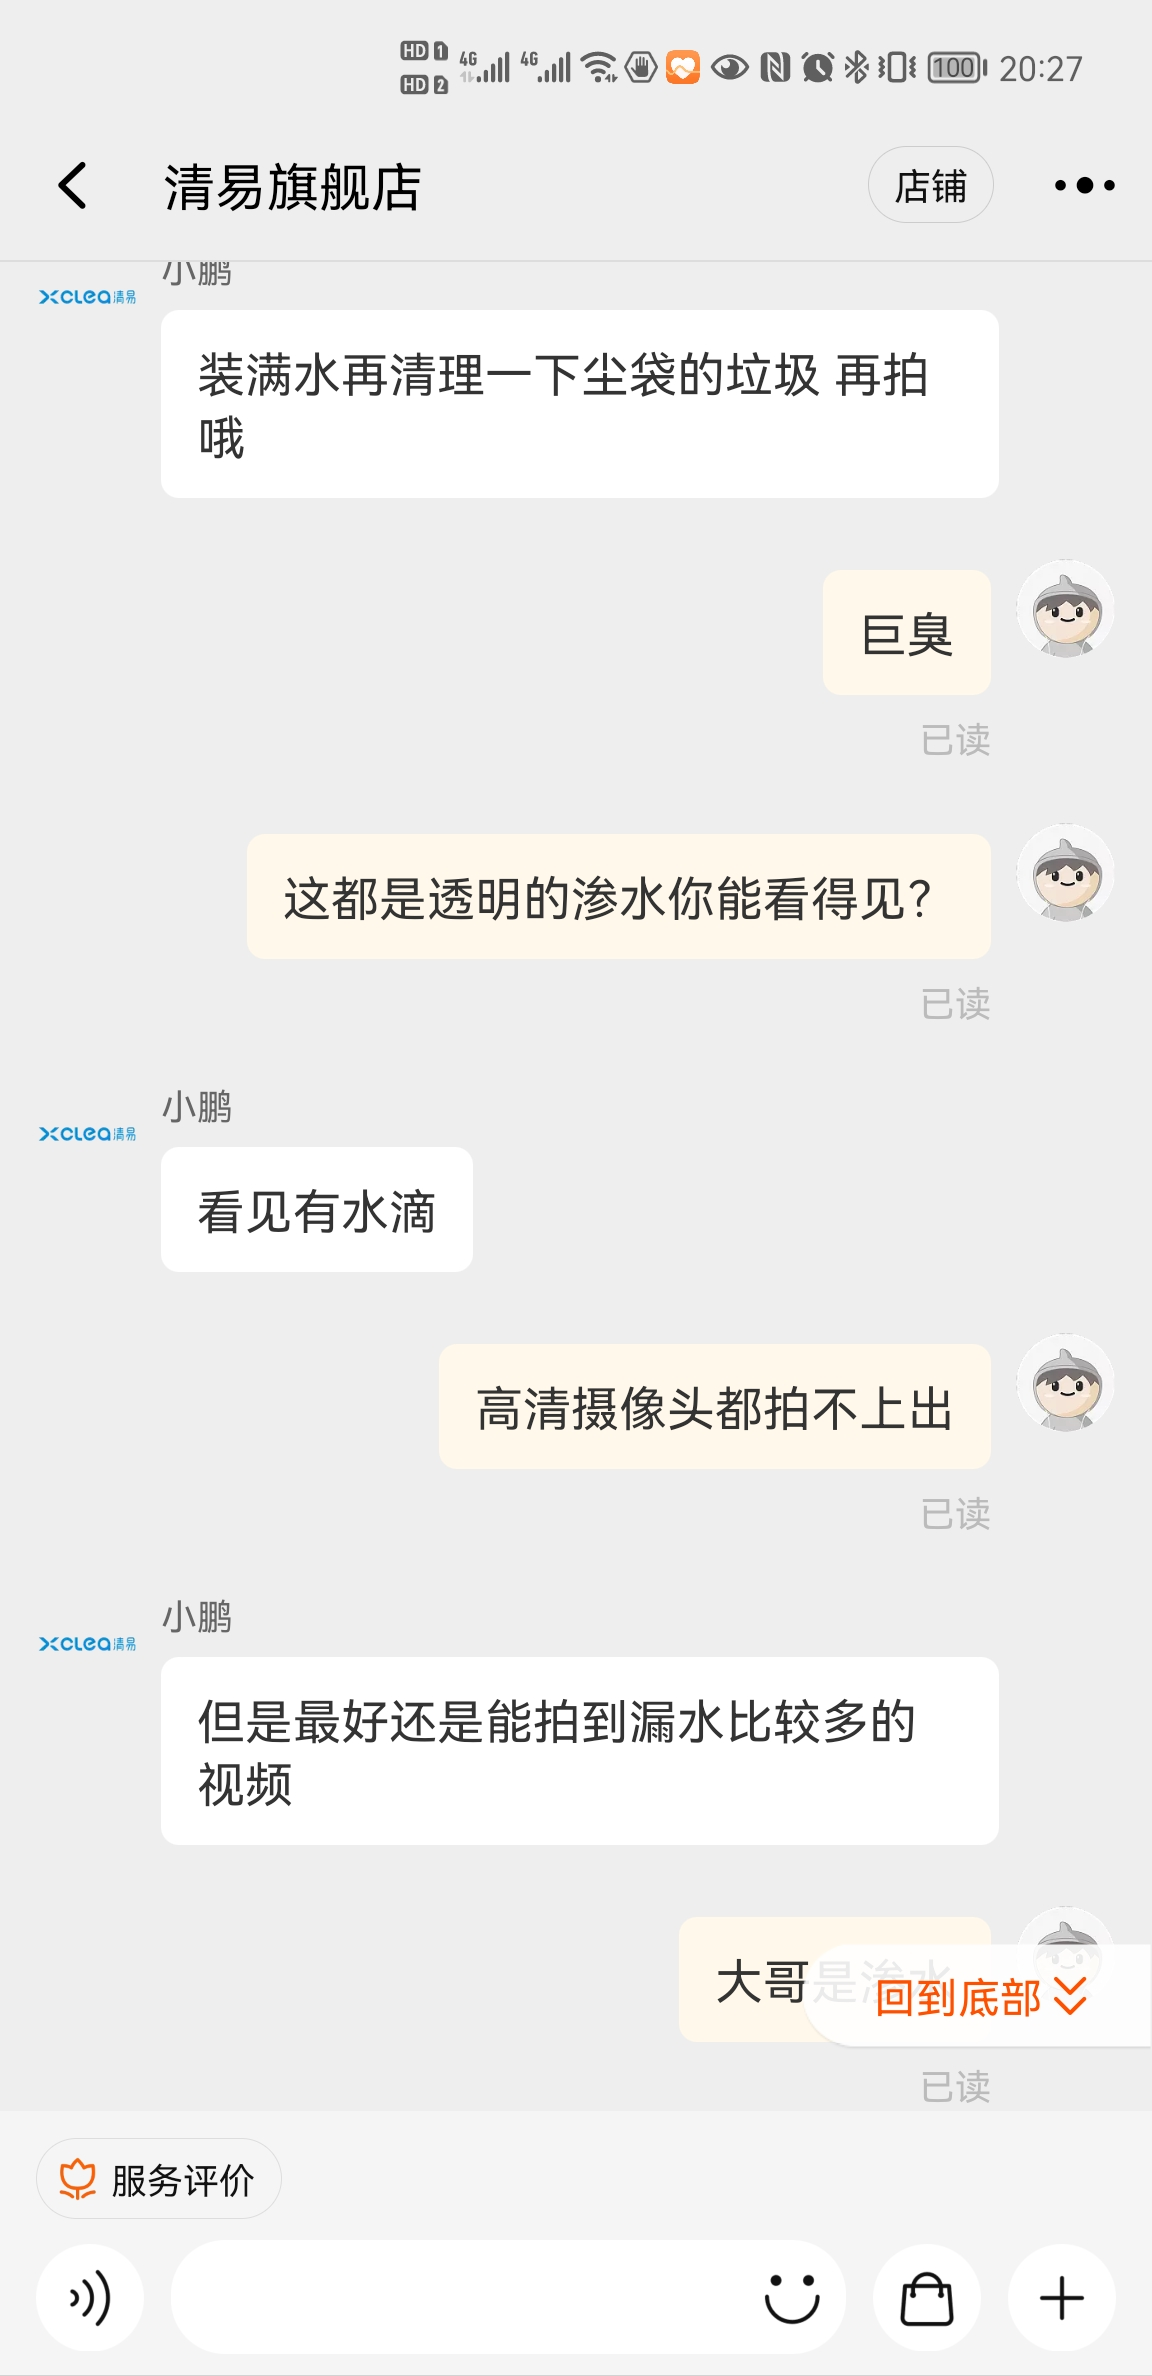 Screenshot_20210903_202800_com.taobao.taobao.jpg